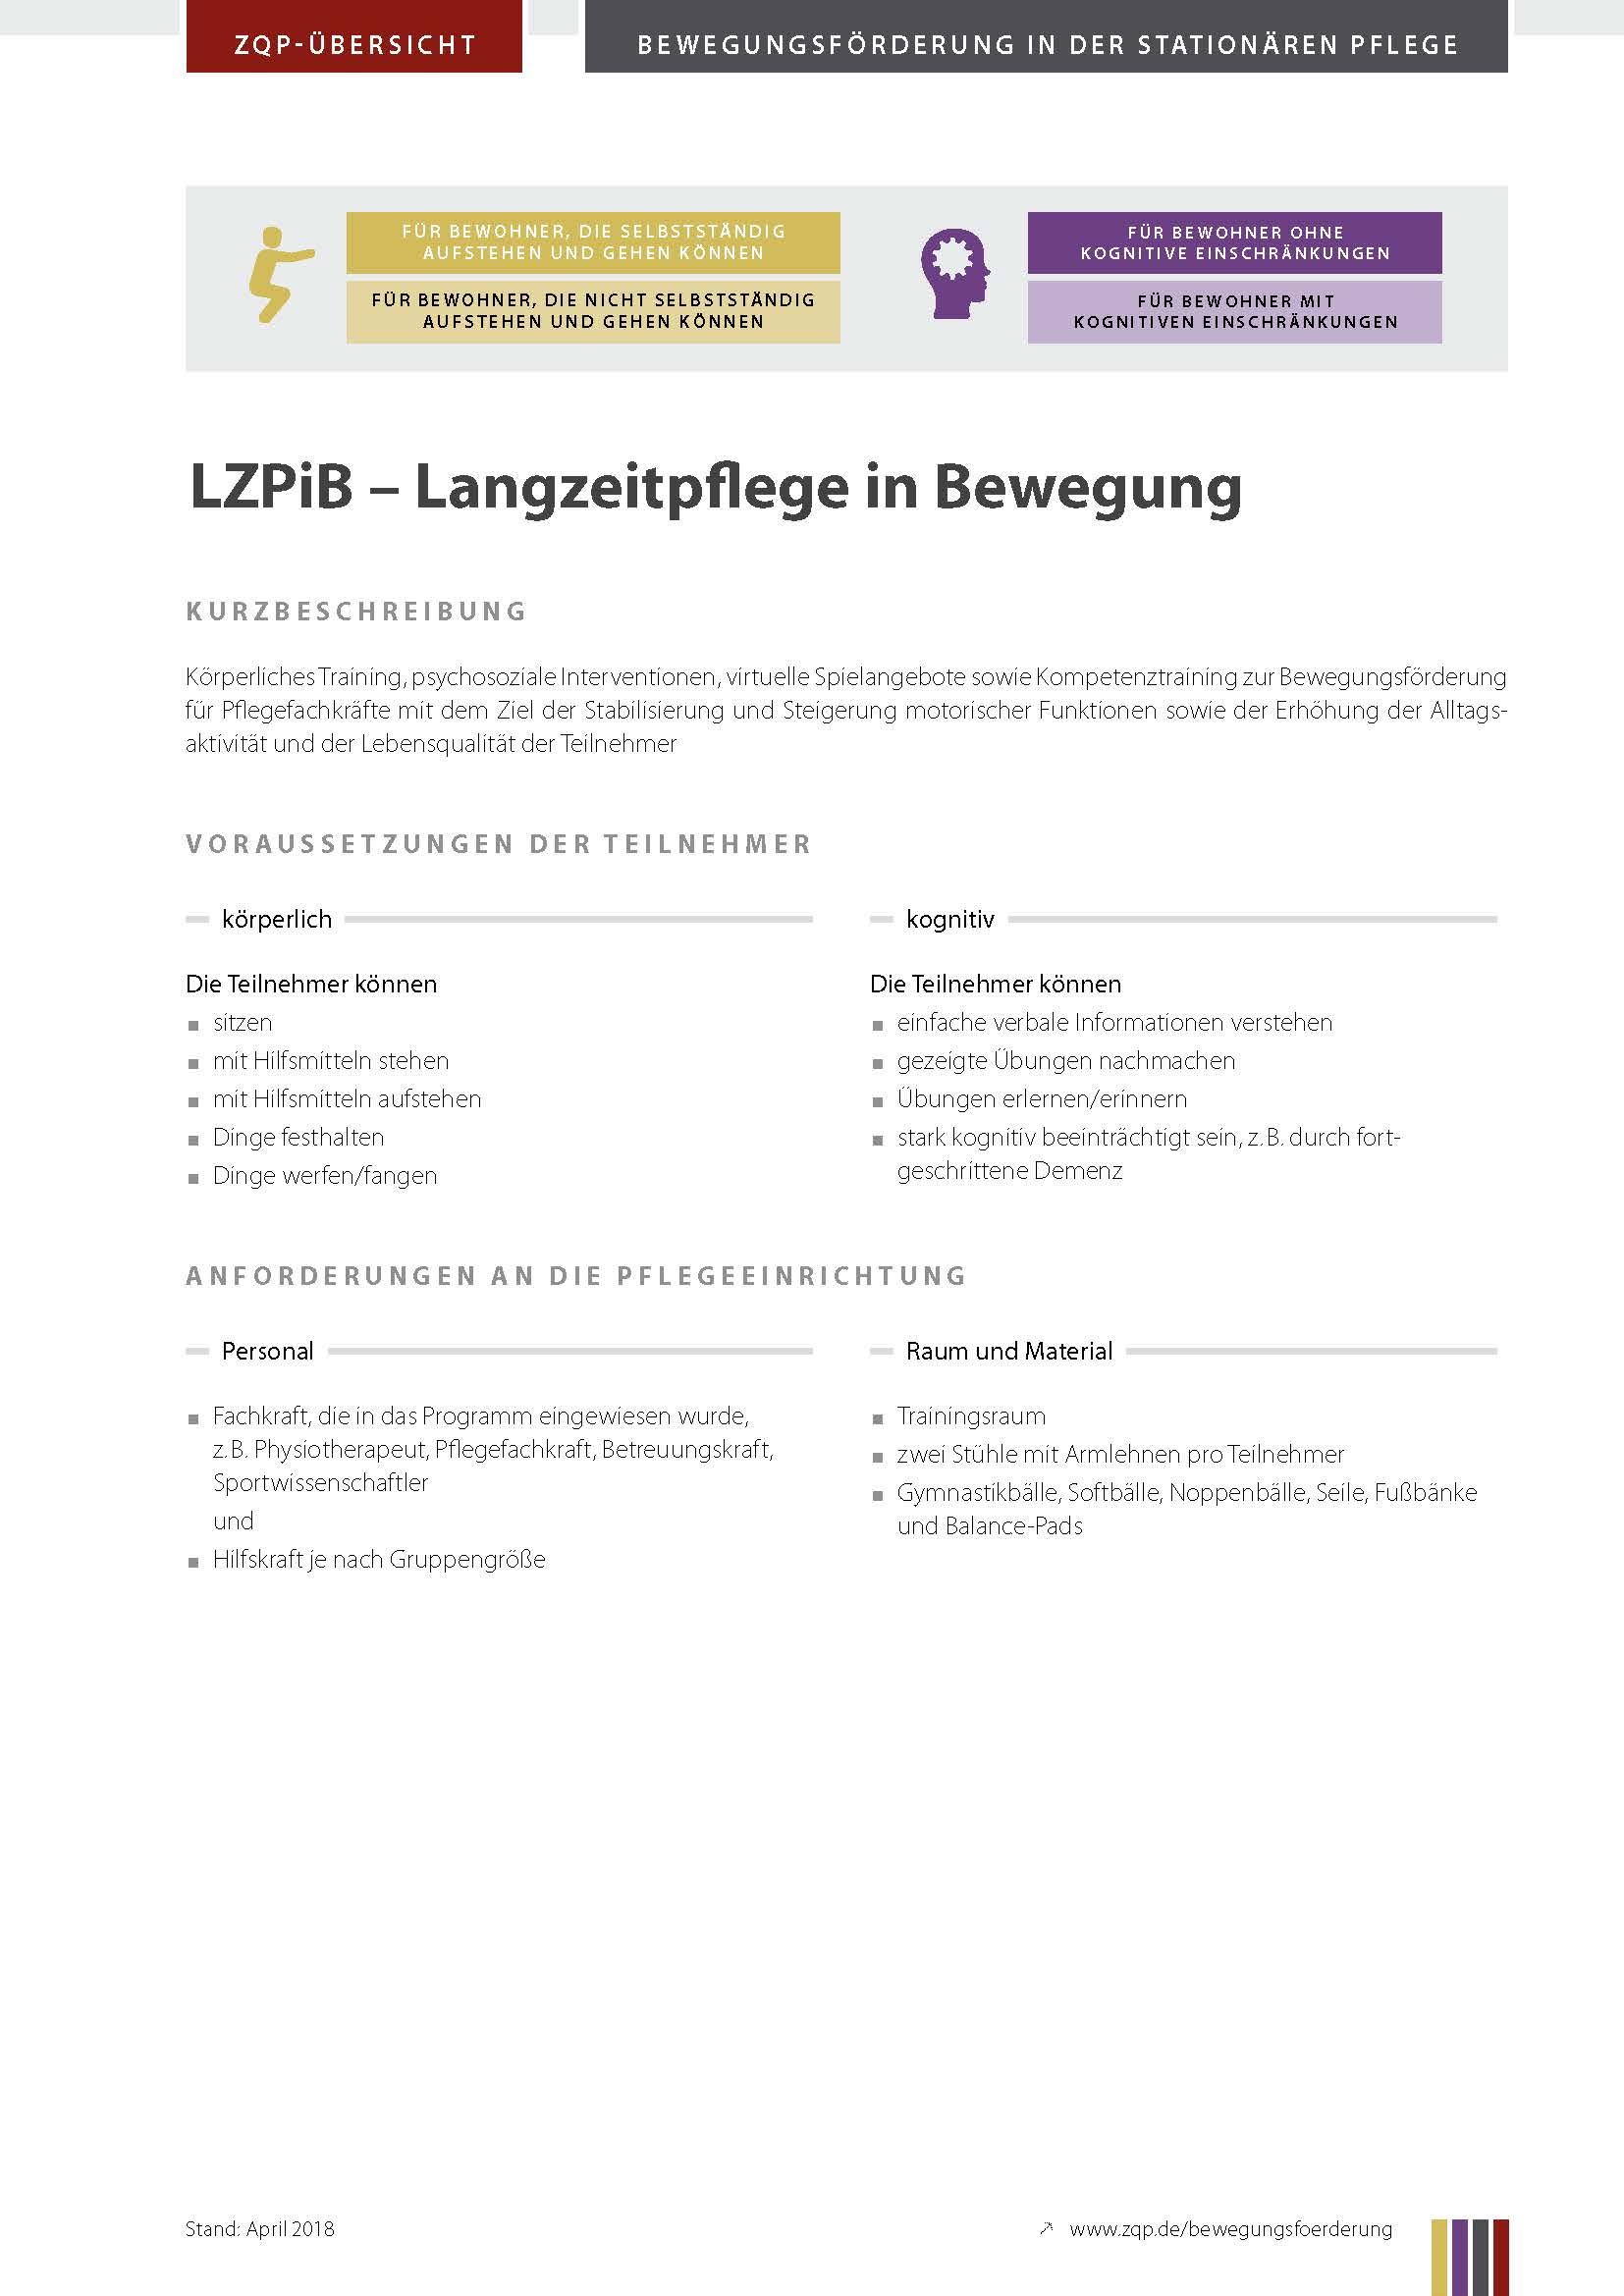 Titelblatt Langzeitpflege in Bewegung